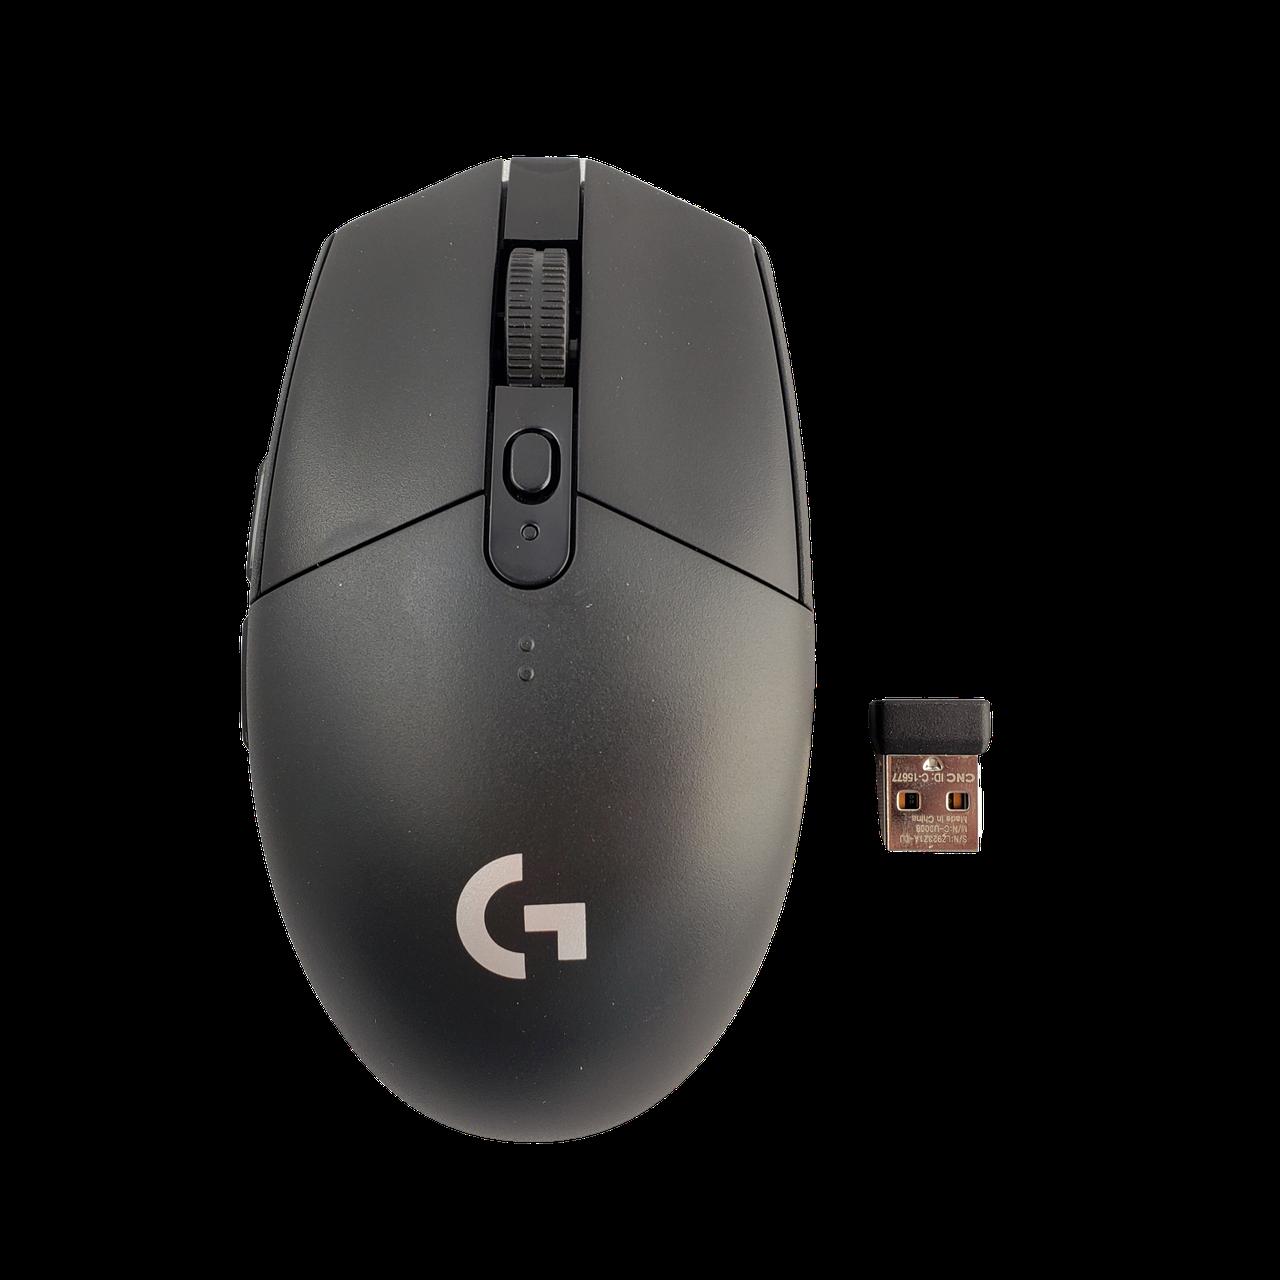 Мышь Logitech G305 Lightspeed Wireless Gaming Mouse Black Витрина